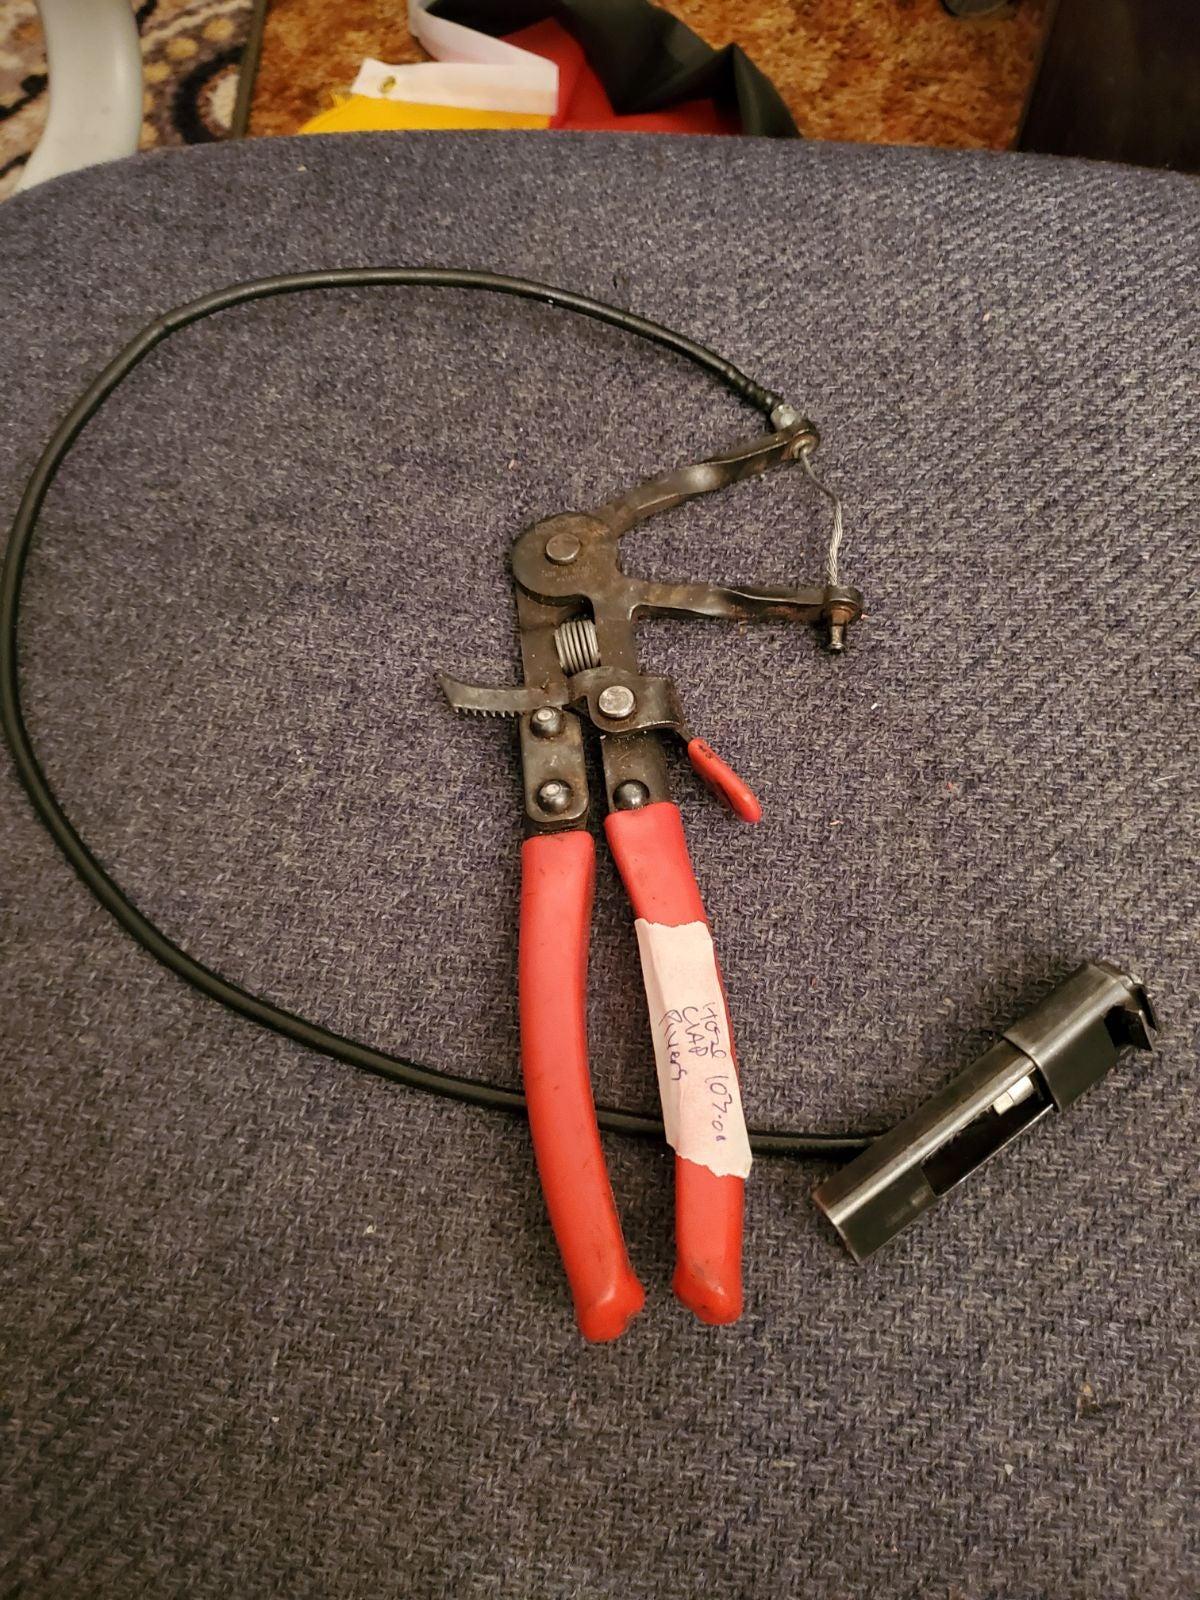 Mayhall clamp  Pliers